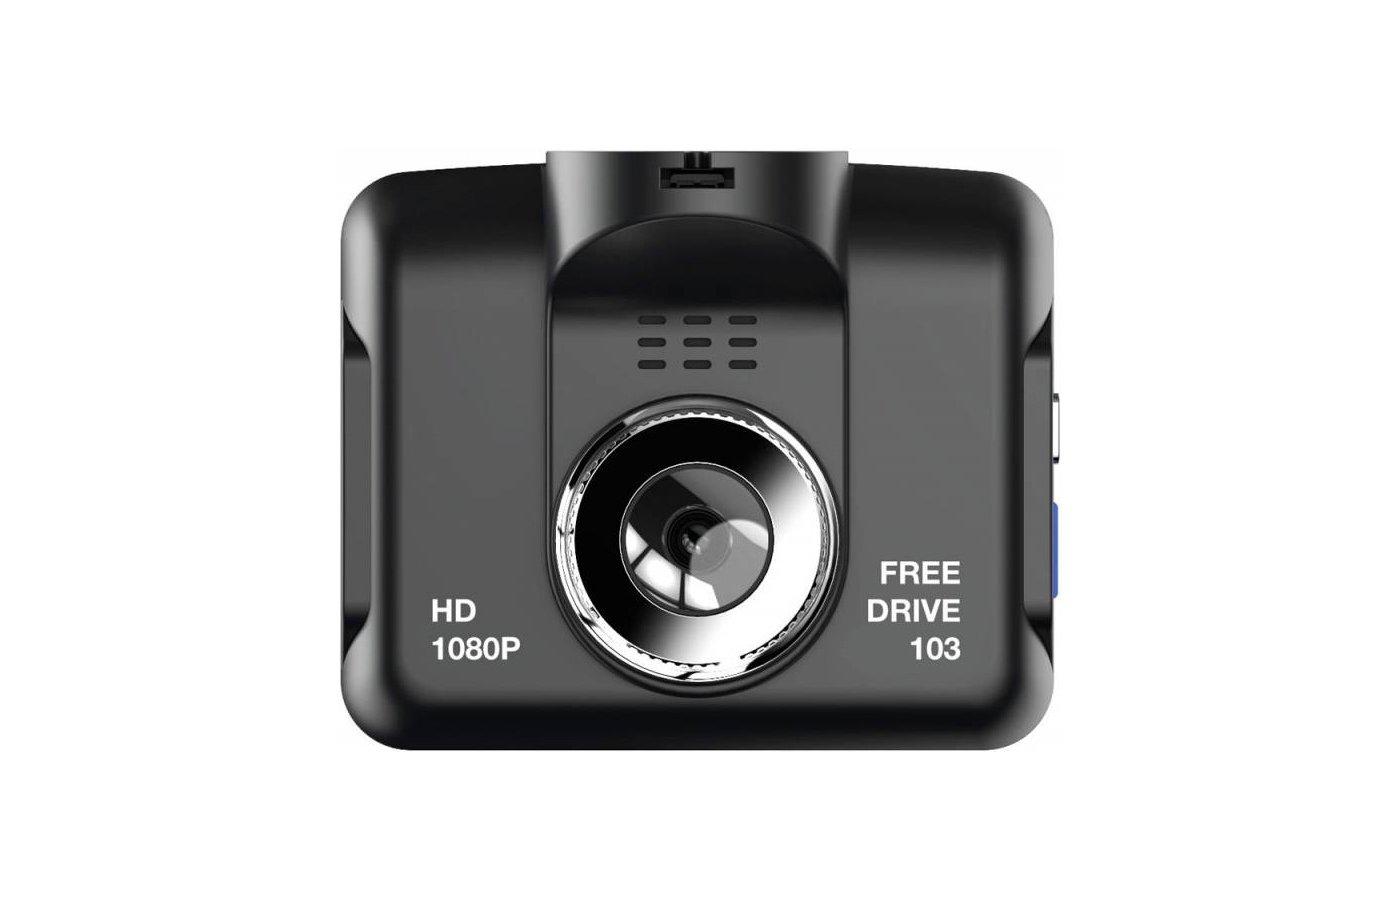 Видеорегистратор Digma FreeDrive 103 Black